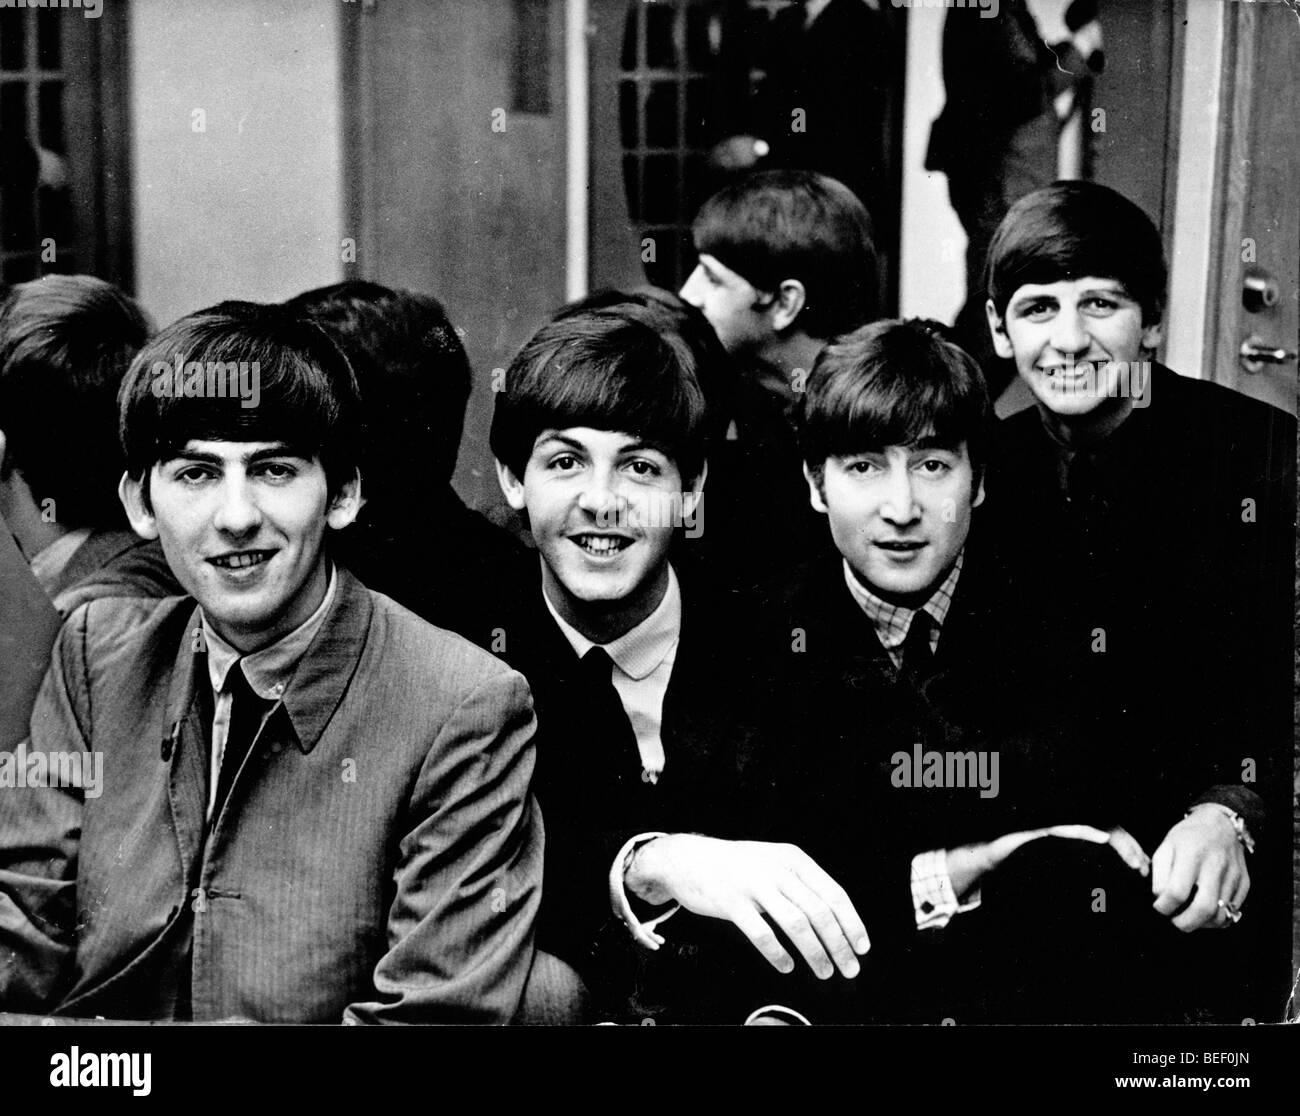 The Beatles - George Harrison, Paul McCartney, John Lennon and Ringo Starr. Stock Photo